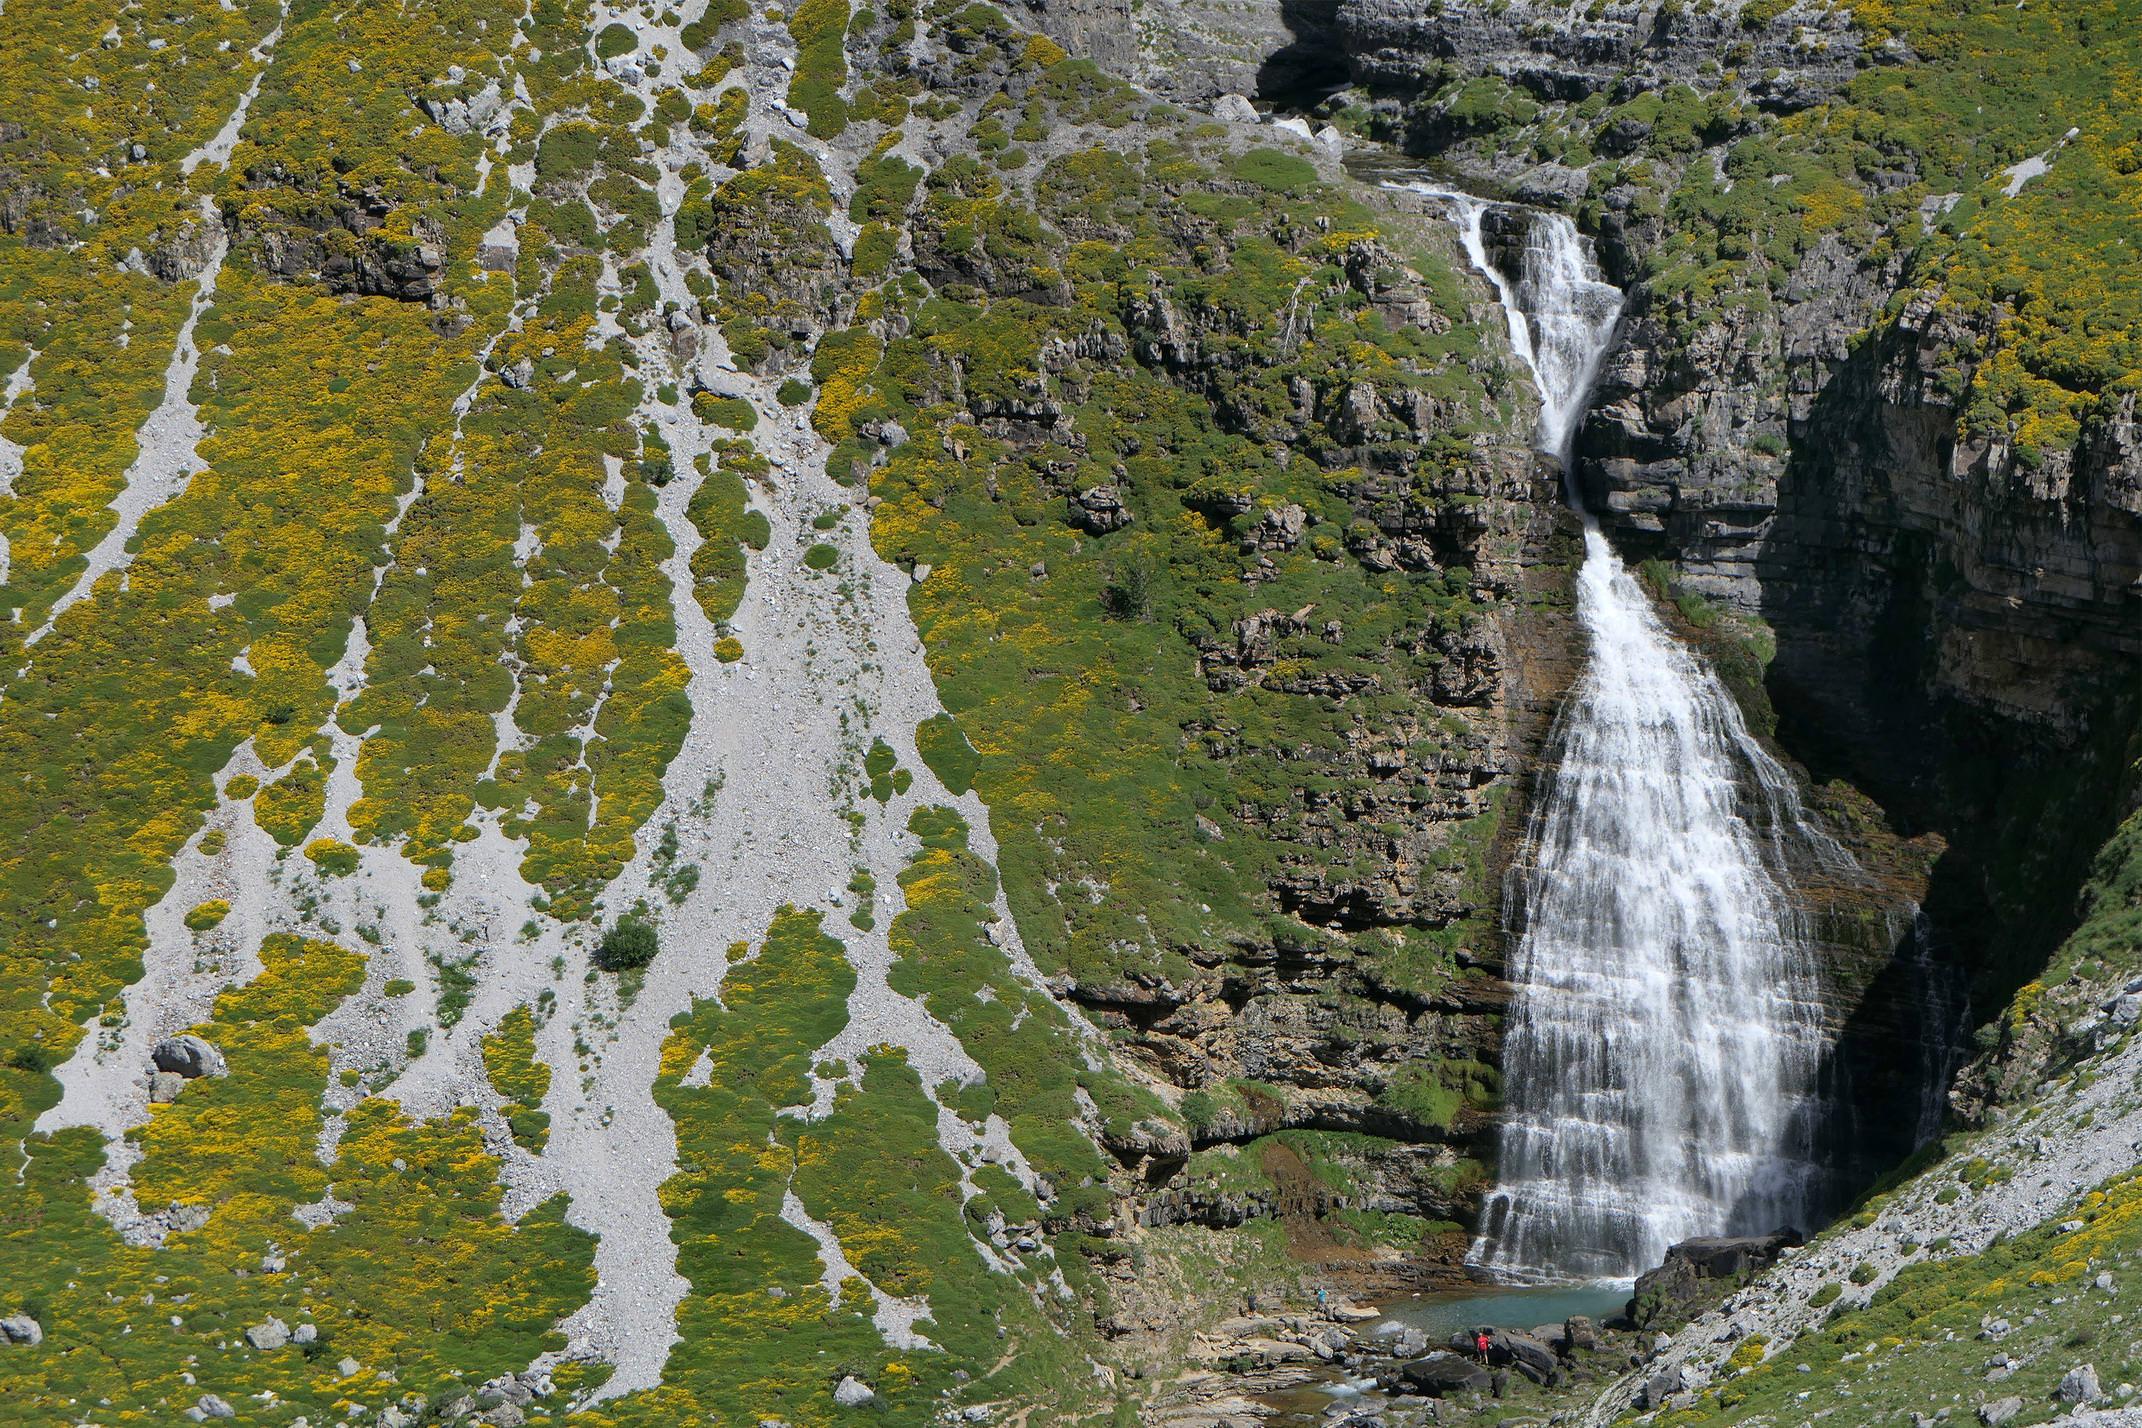 Spain huesca aragon pyrenees ordesa cola de caballo waterfall scree mirror c diego